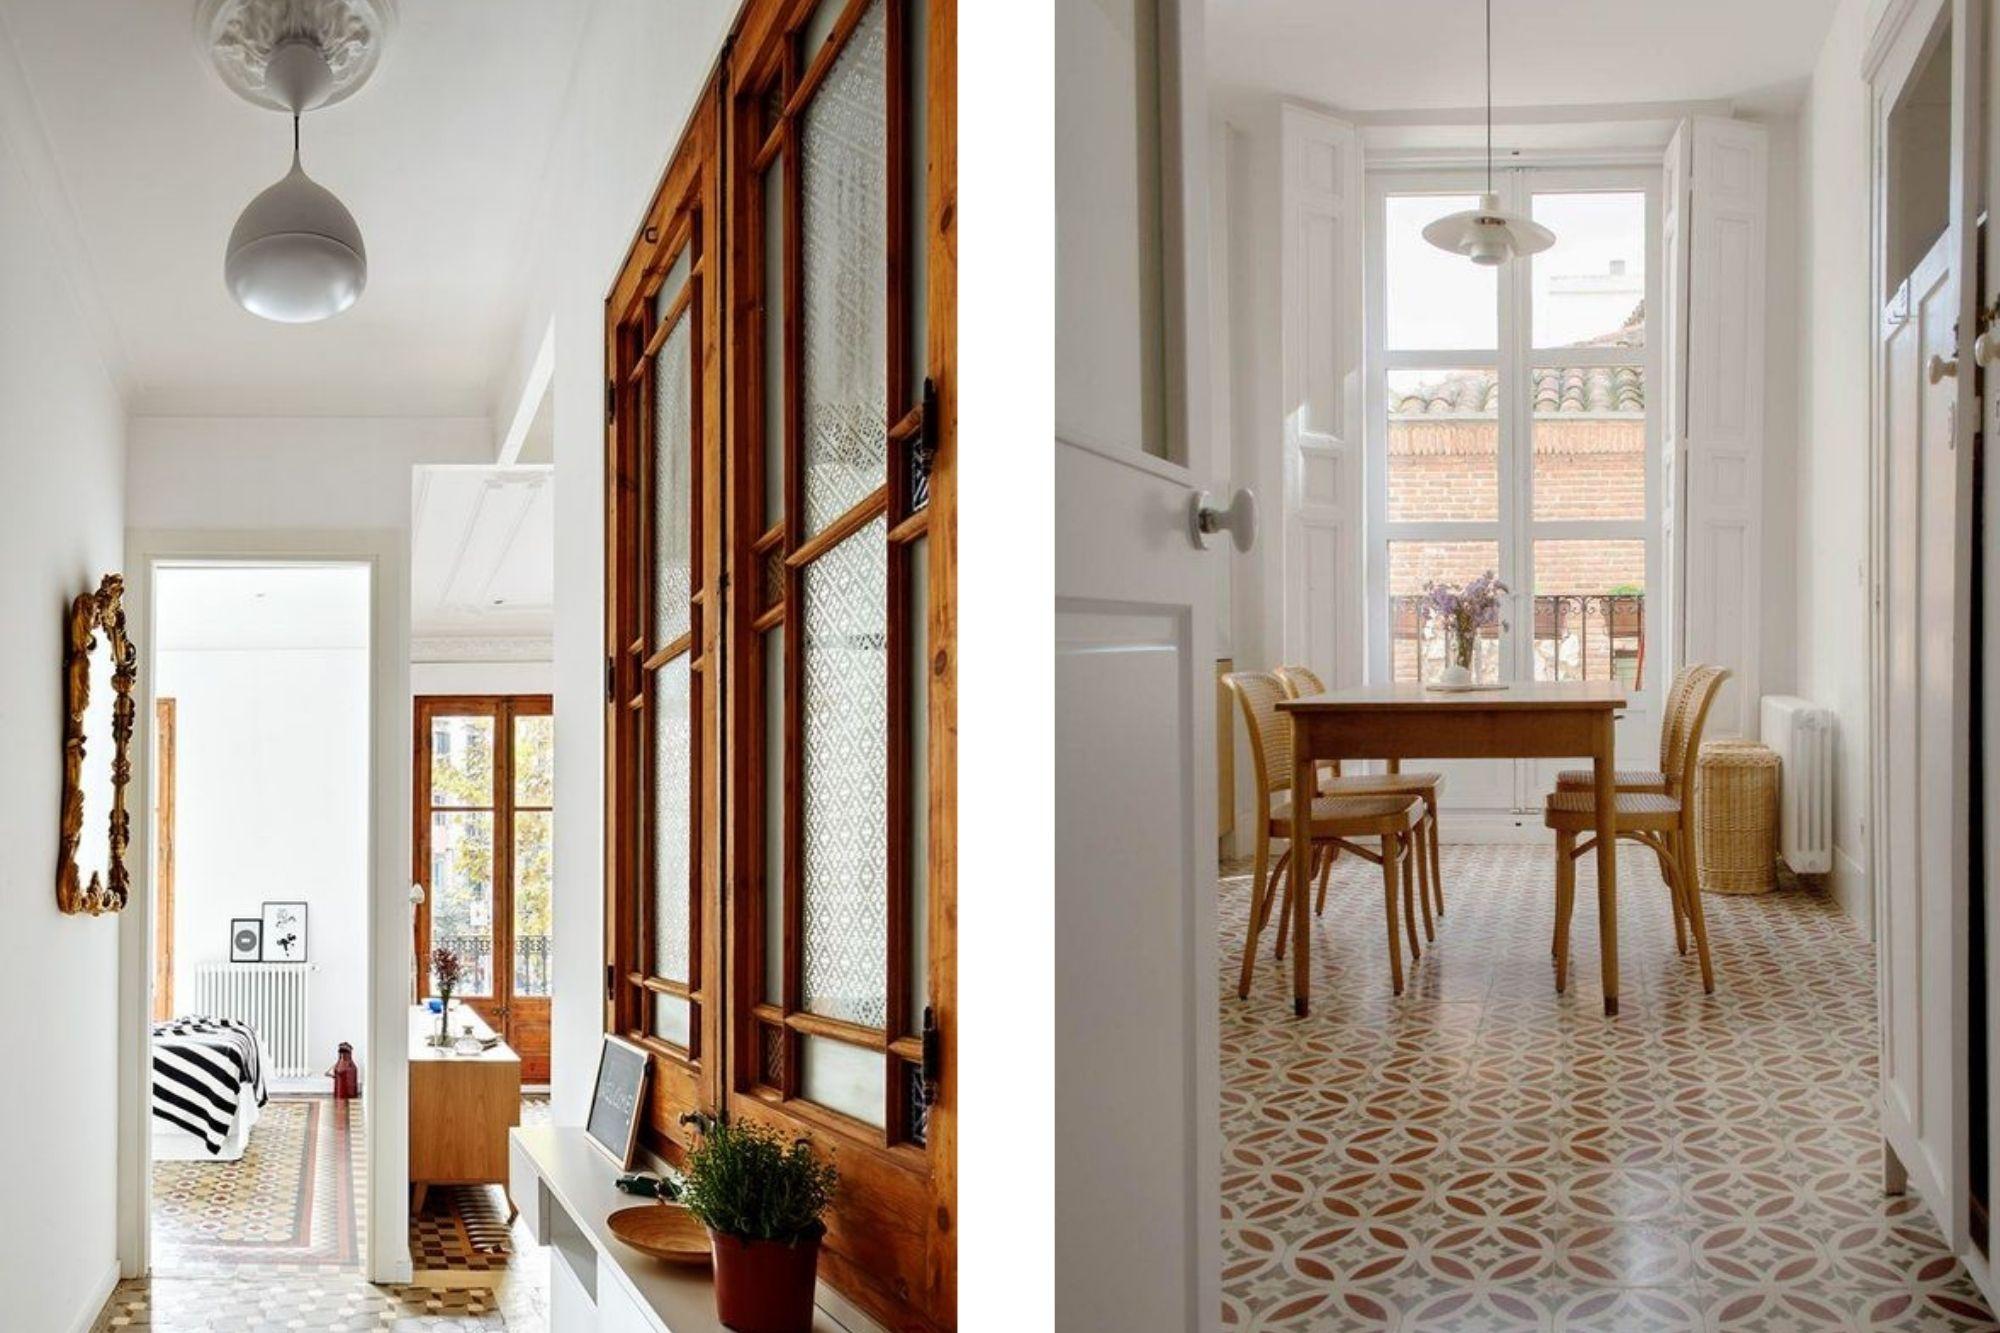 pisos antiguos reformados